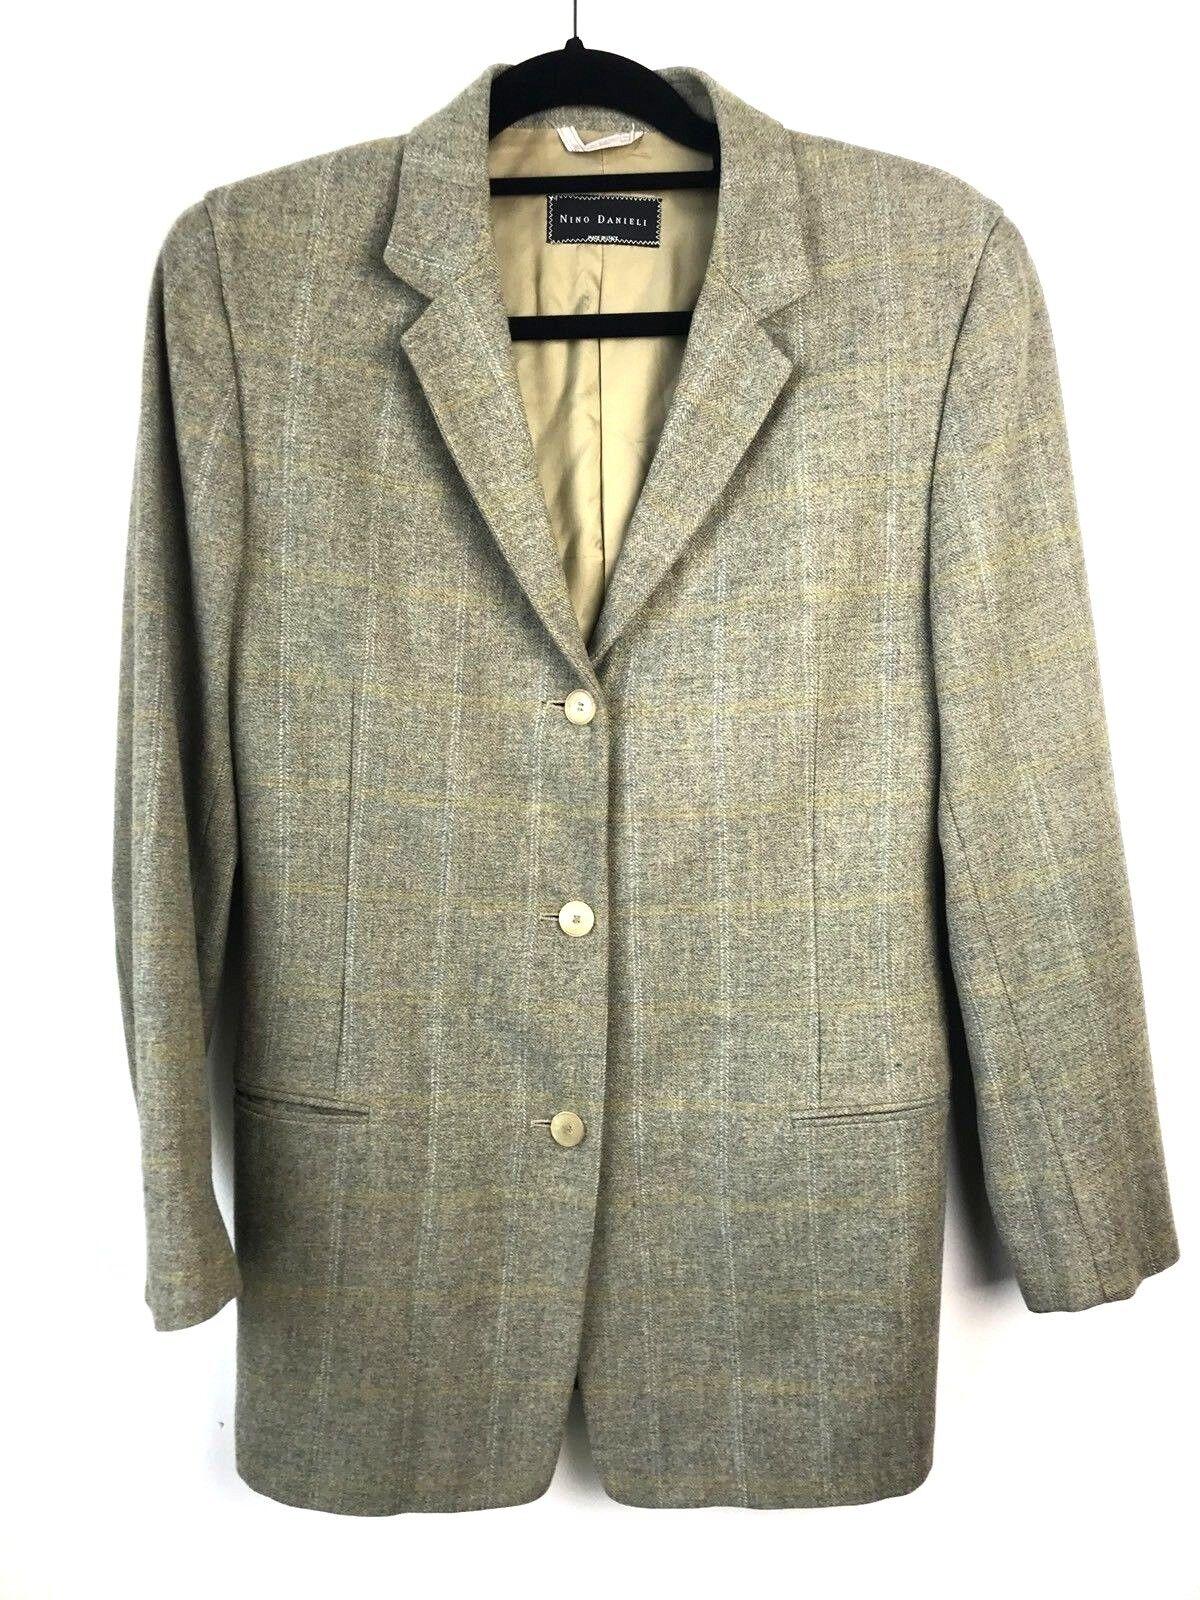 Nino Danieli Größe 44R Grün Plaid Extra Fine 100% Virgin Wool Sports Coat Blazer